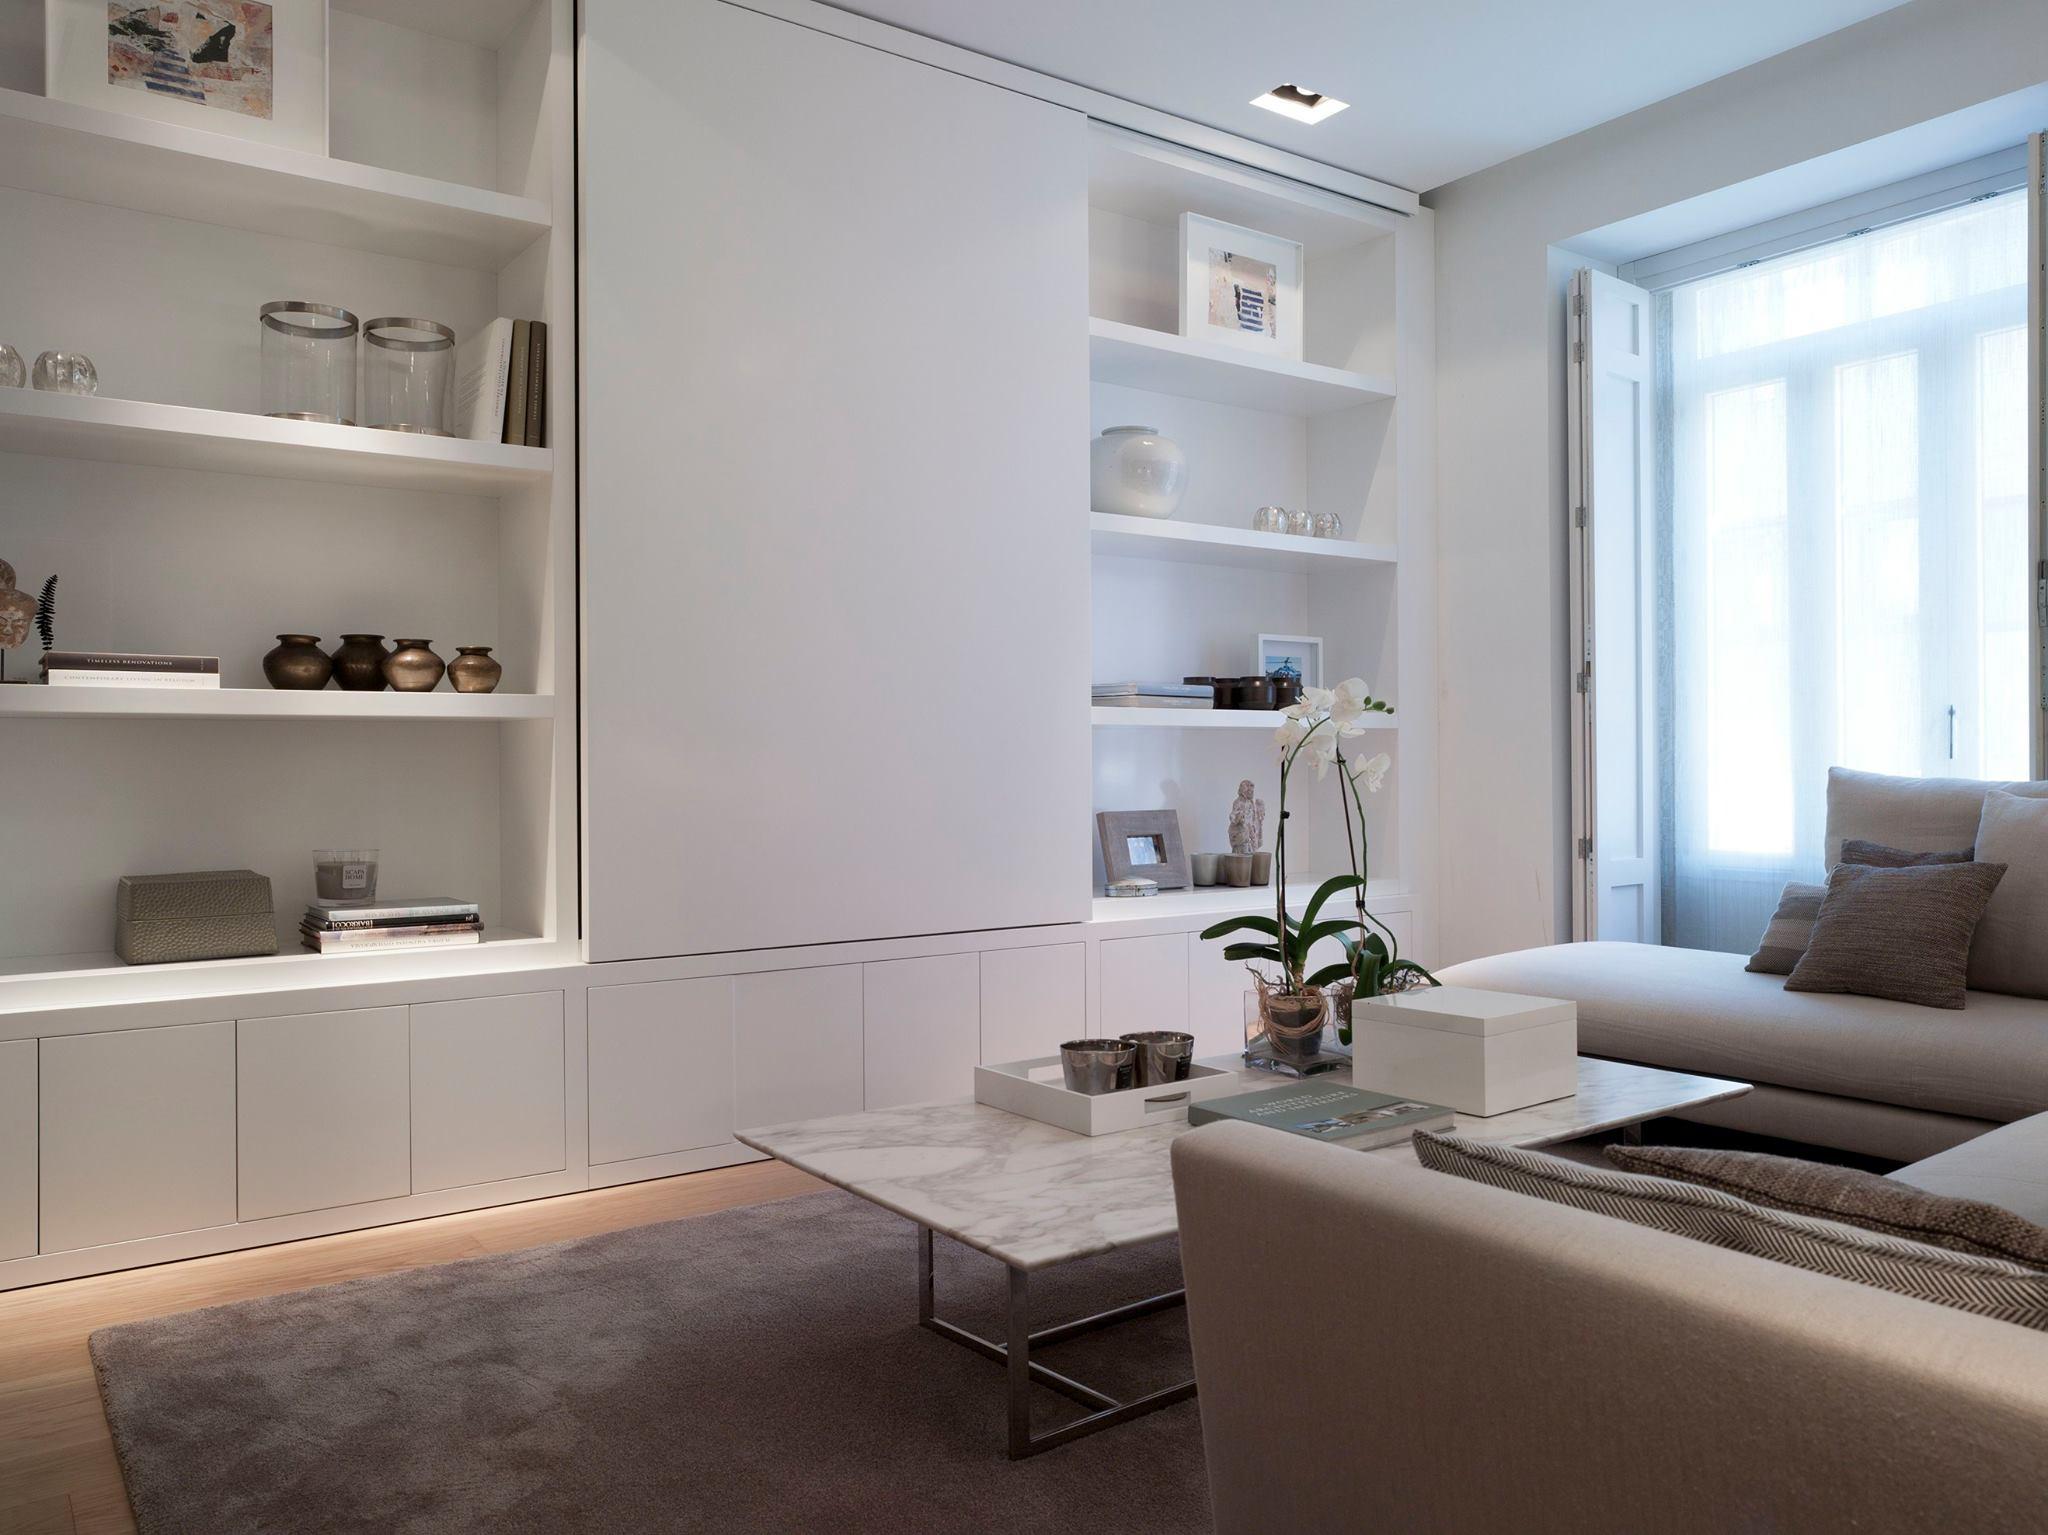 reforma-residencial-interiorismo-Salon